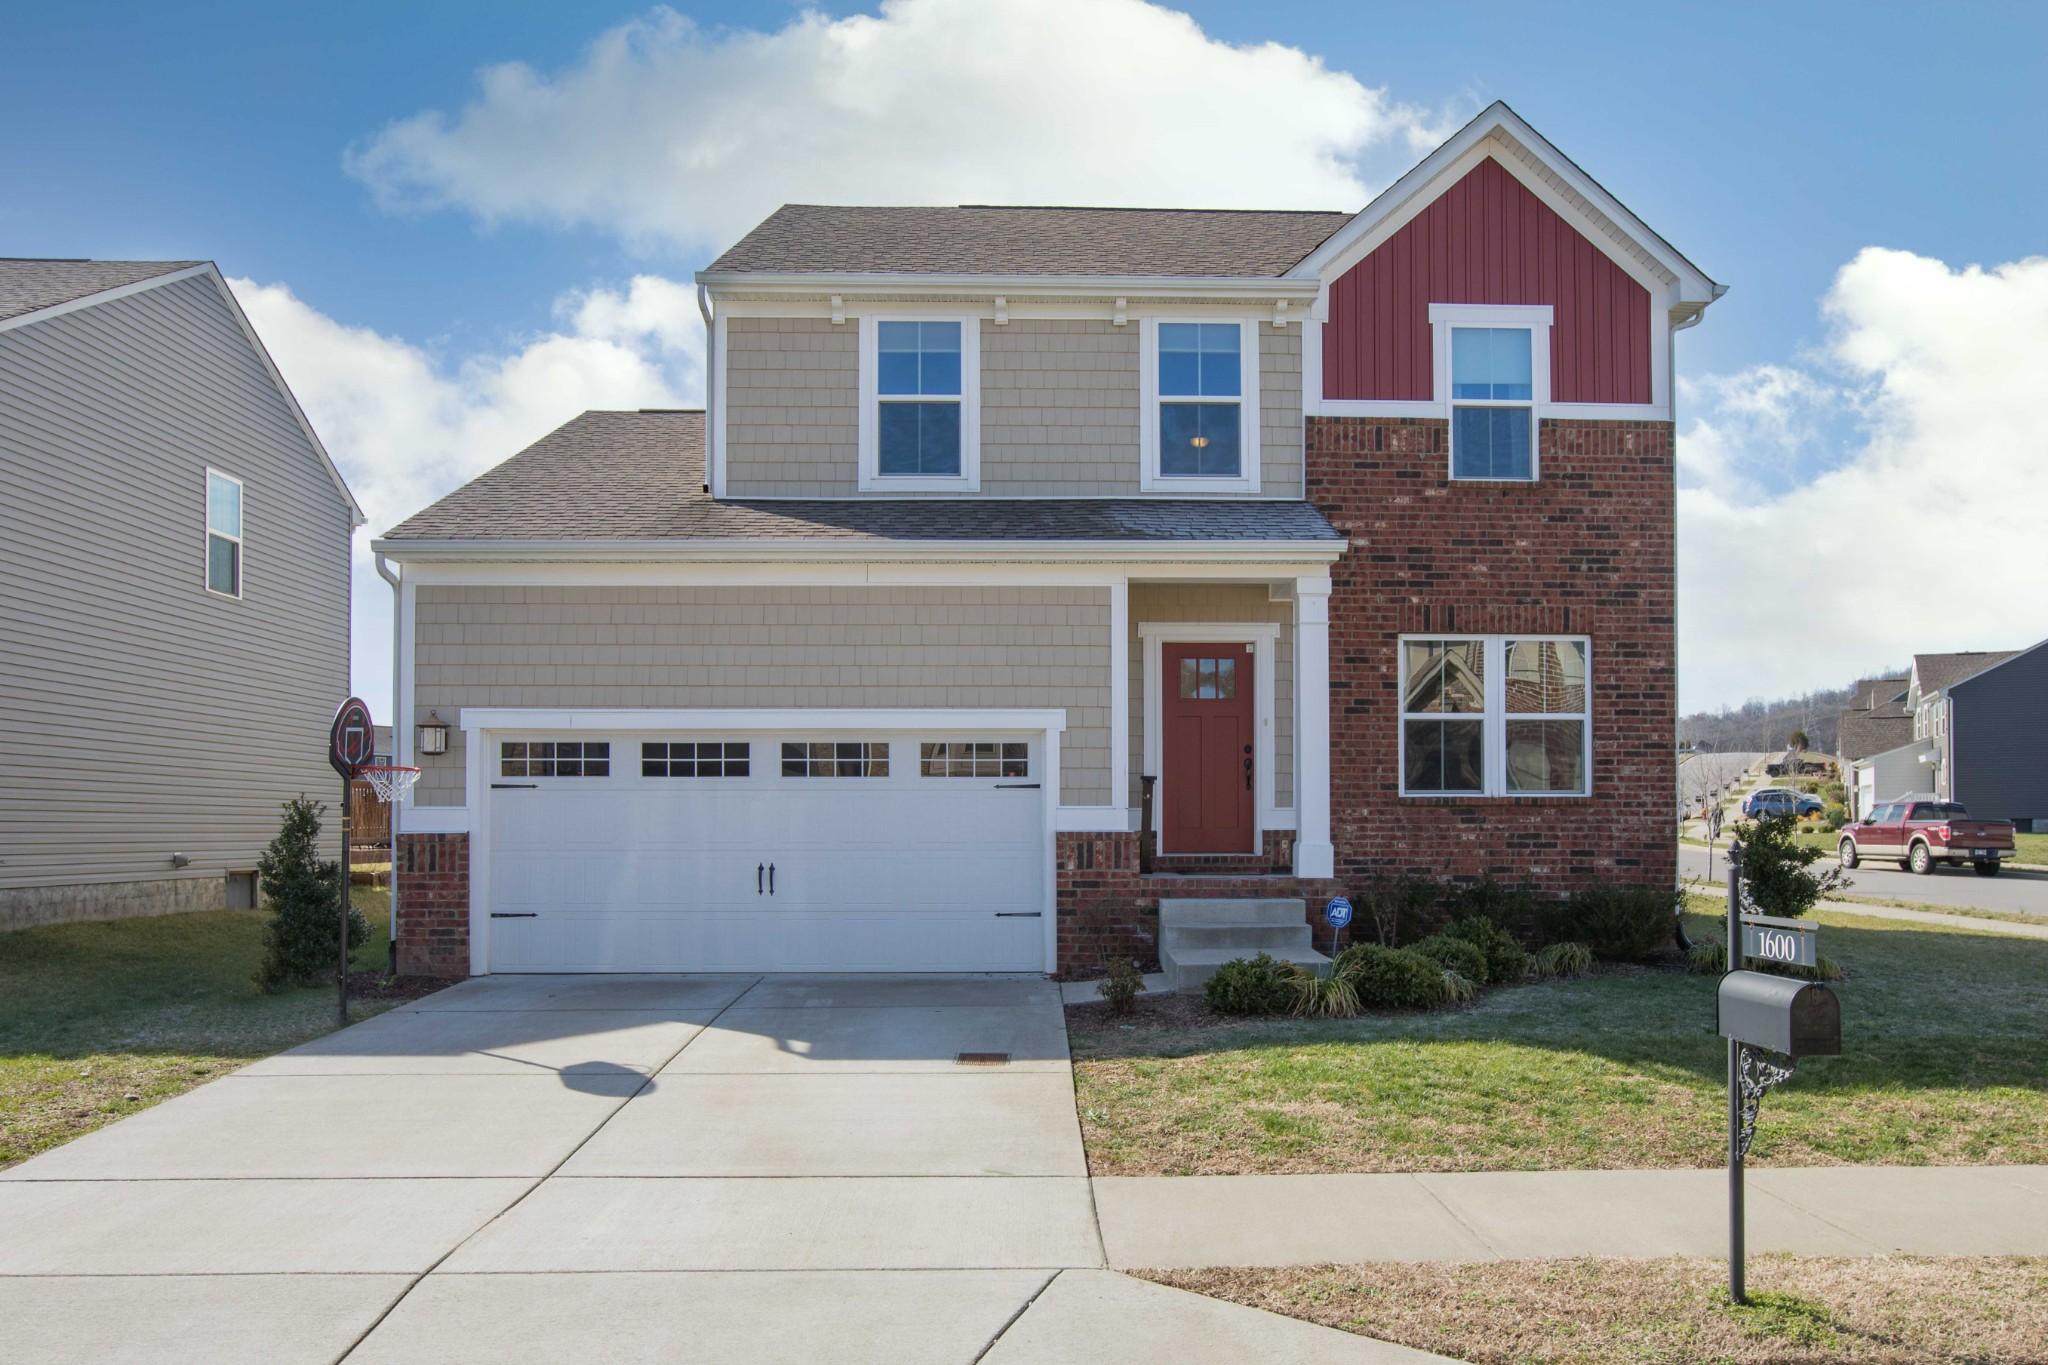 1600 Brockton Ln, Bellevue in Davidson County, TN County, TN 37221 Home for Sale